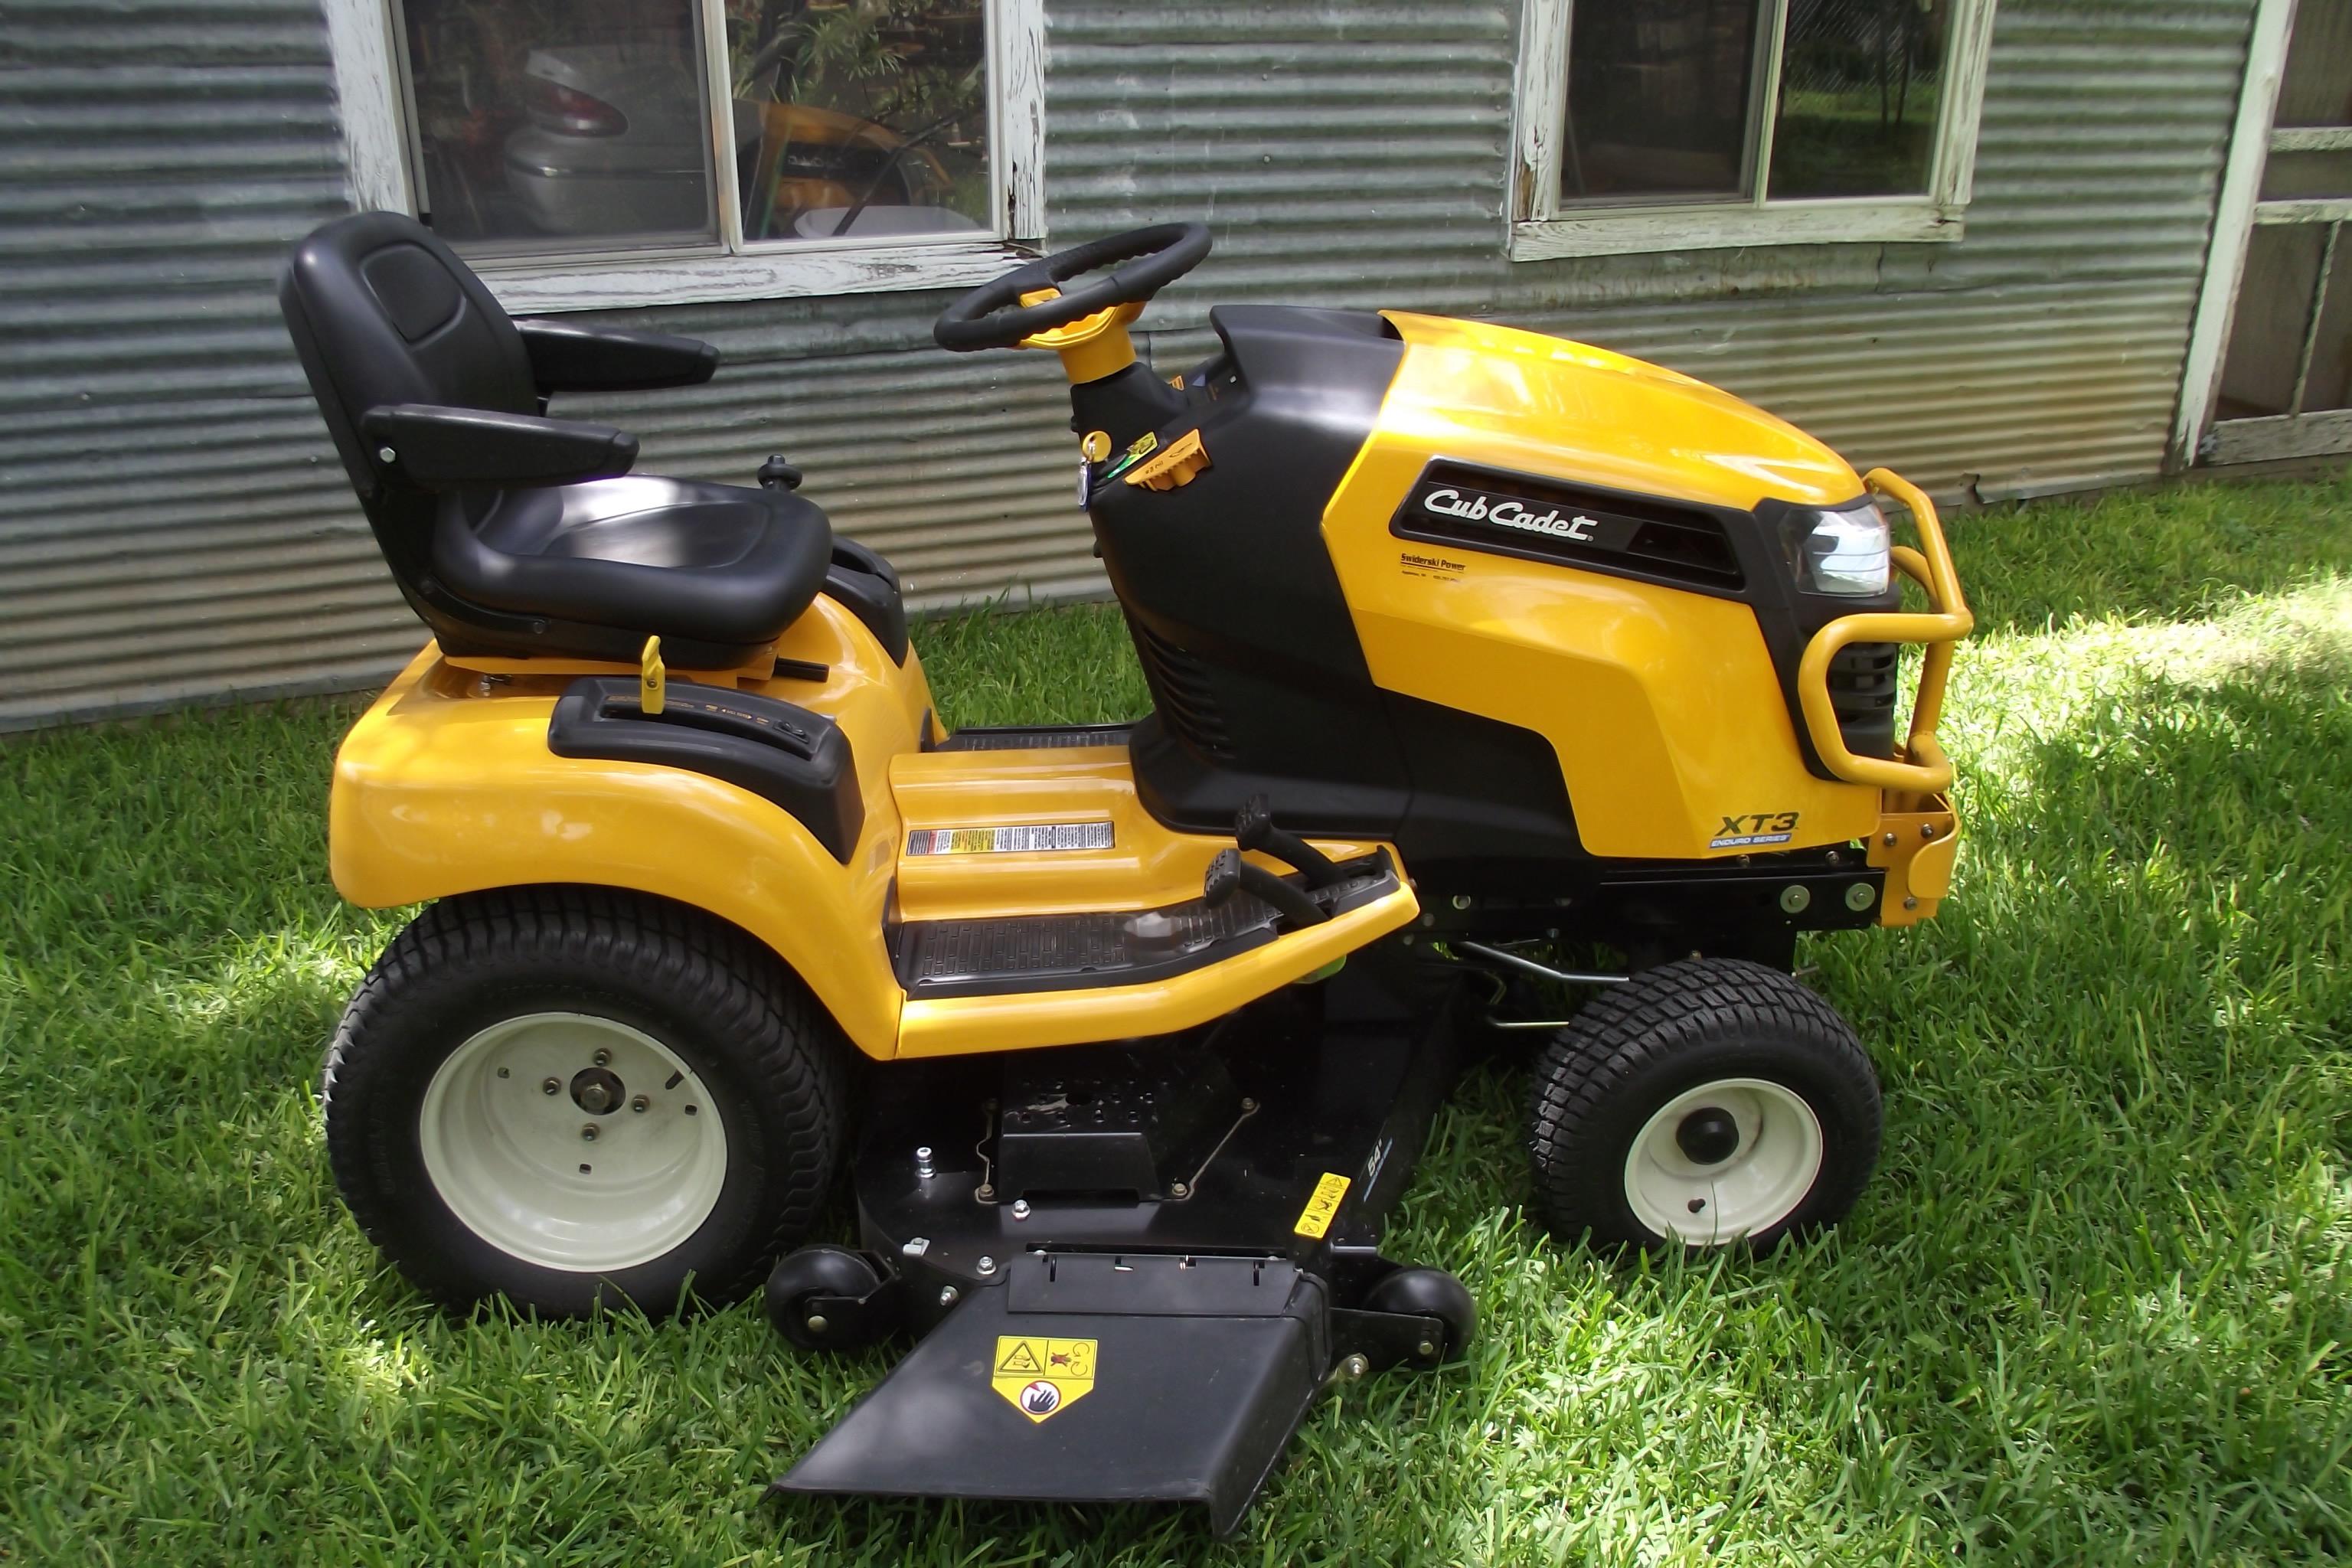 2016 Cub Cadet XT3 GSX Lawn Tractor MyTractorForum The